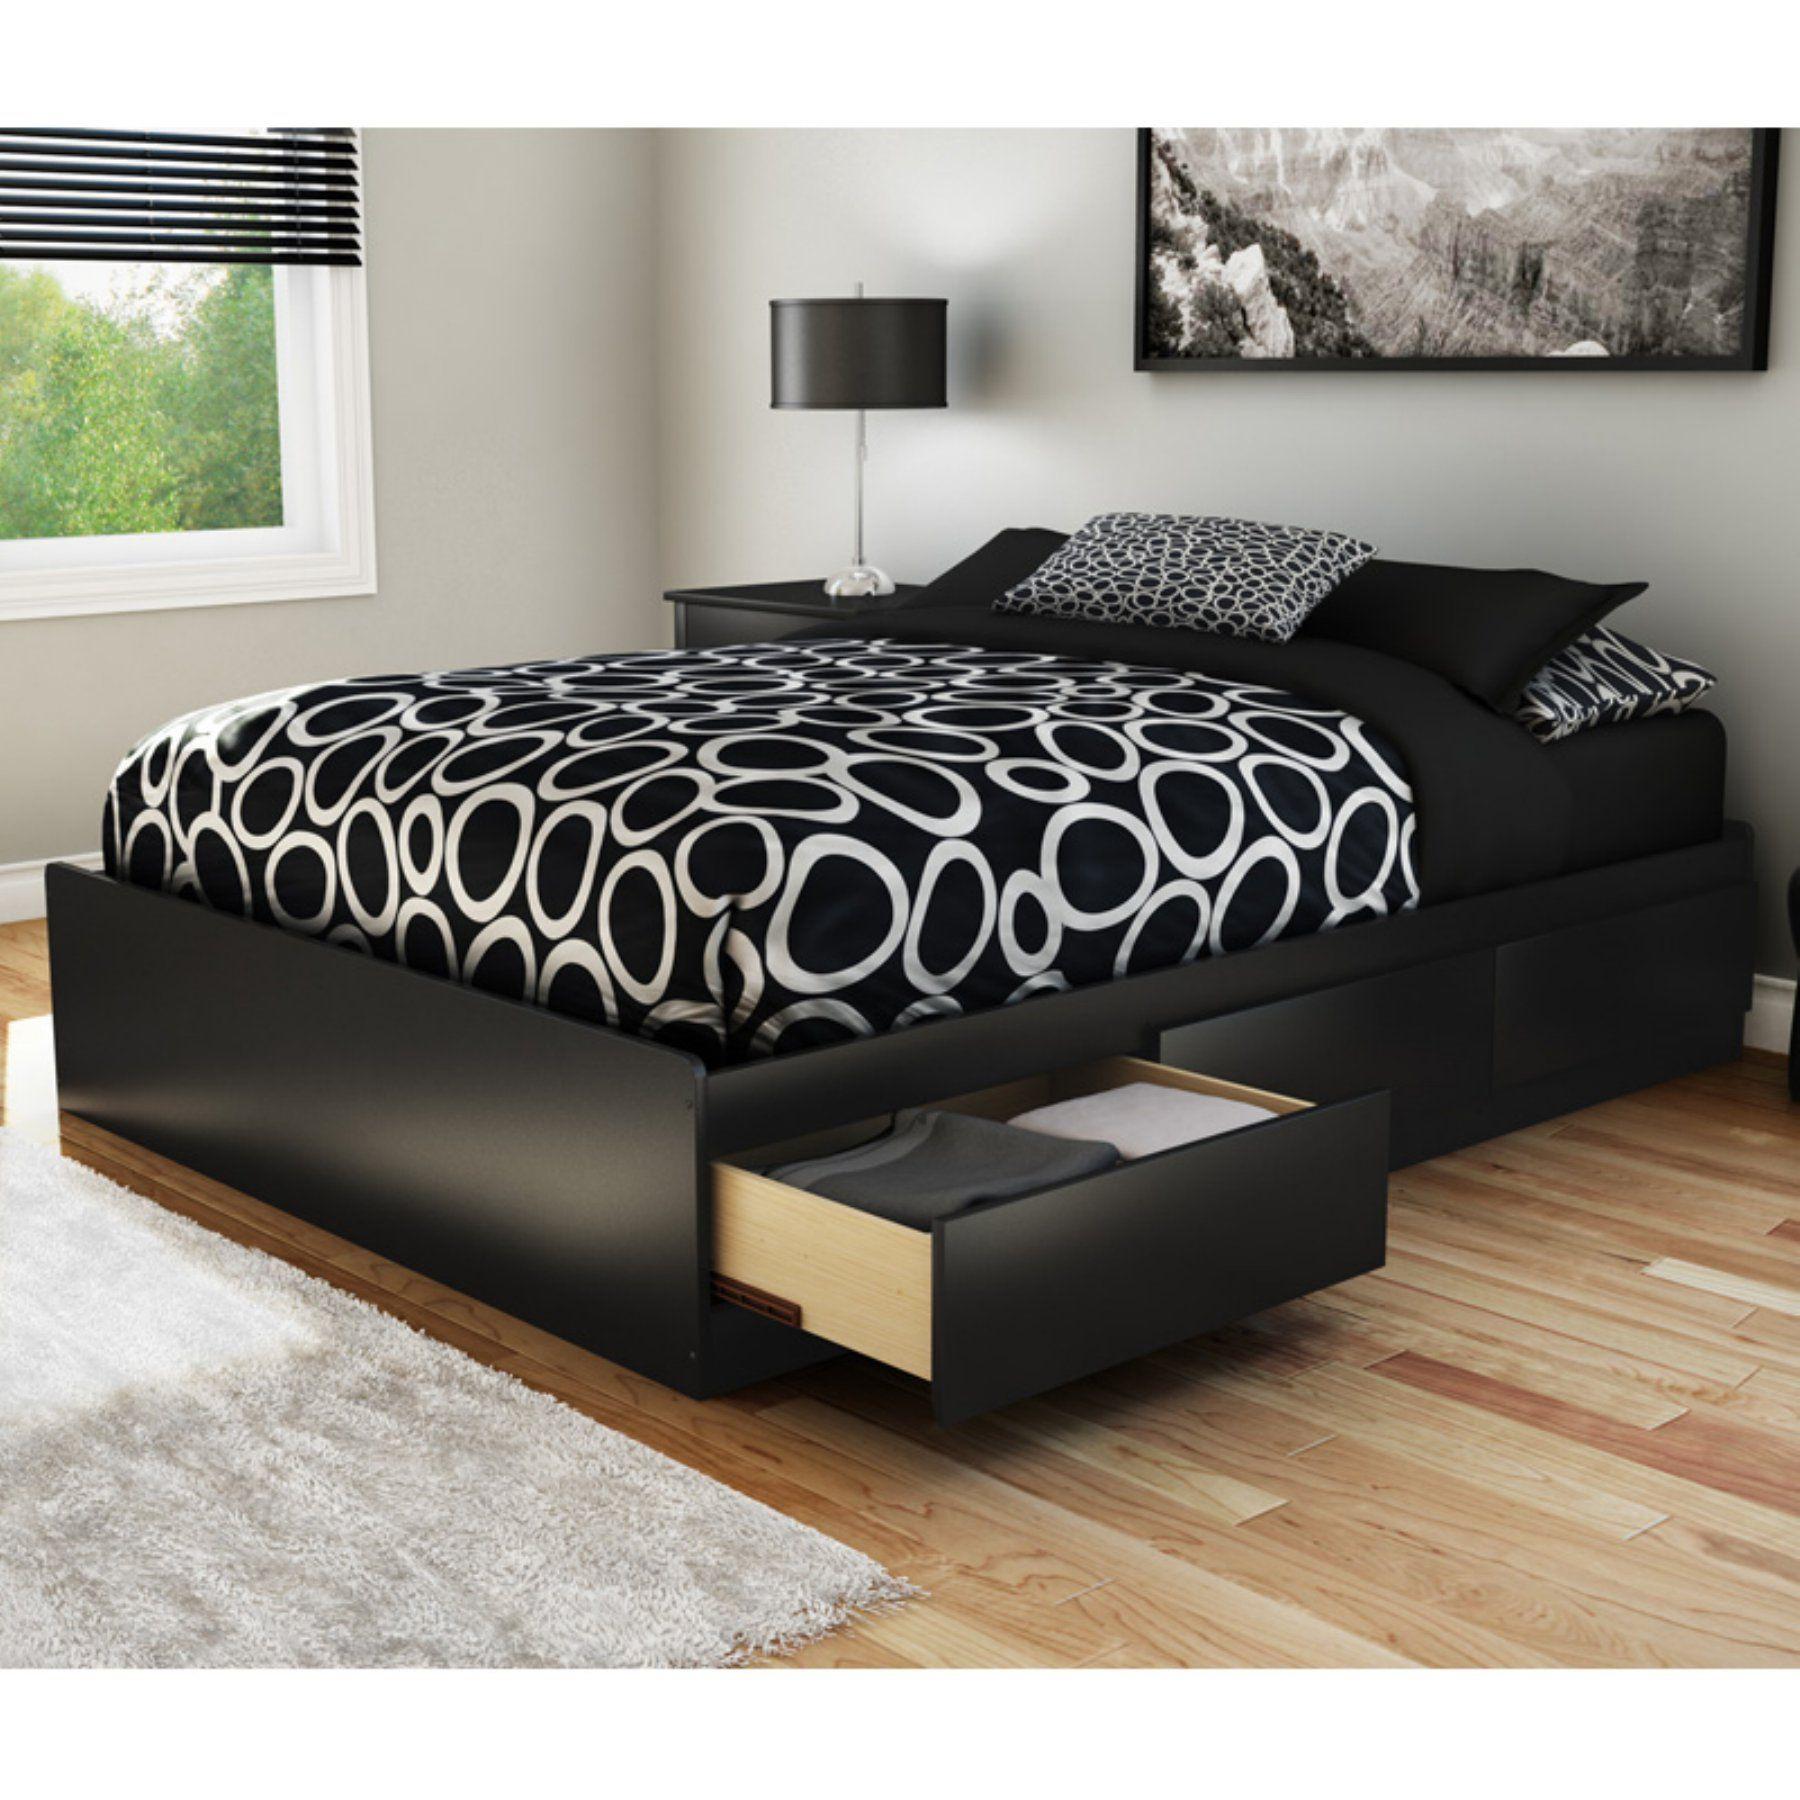 Sandbox Storage Platform Bed - Full - 3107211 | Products | Pinterest